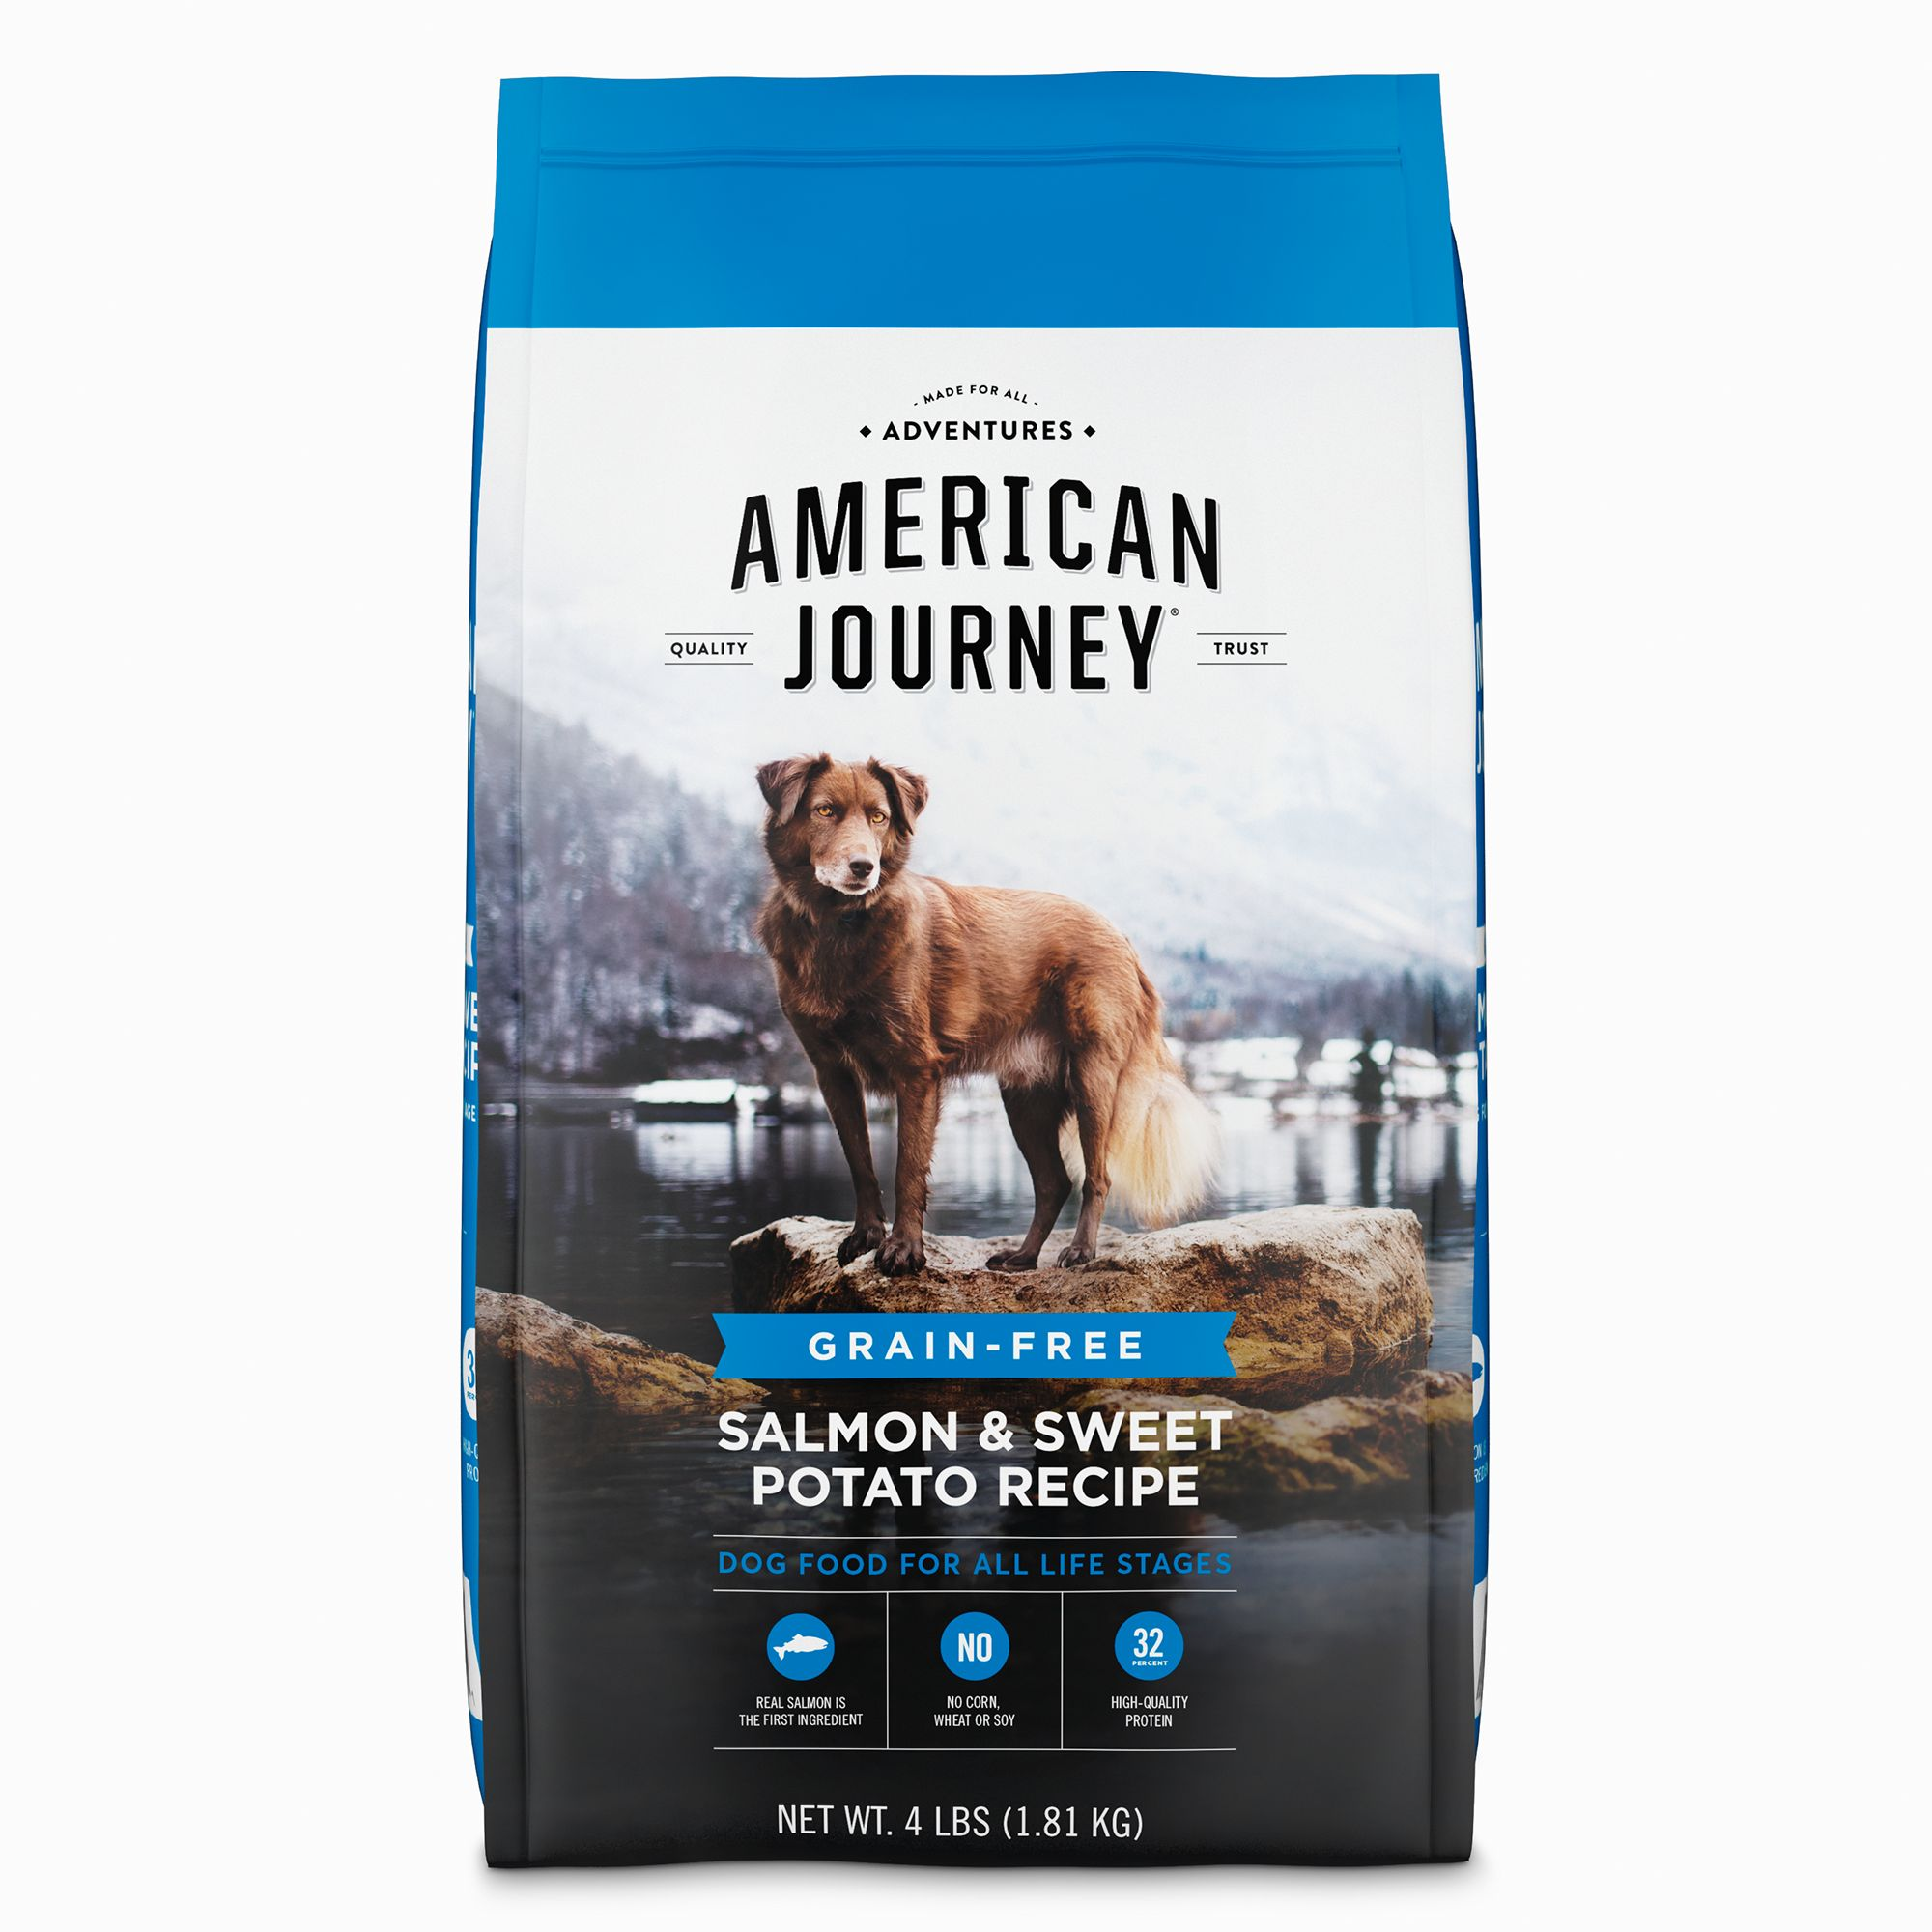 4.American Journey Salmon & Sweet Potato Recipe Grain-Free Dry Dog Food